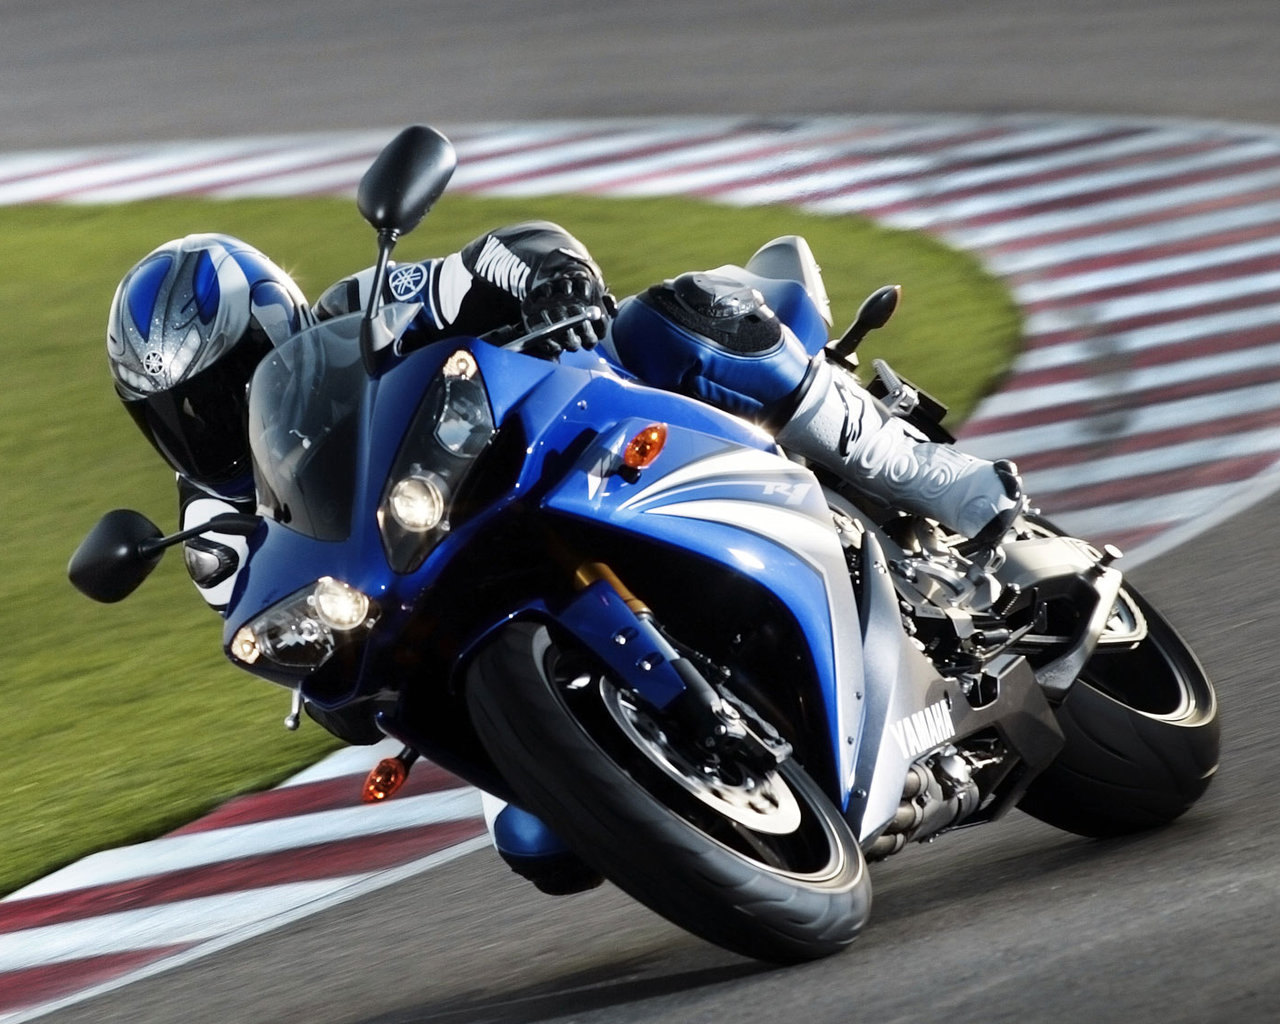 ямаха фото спортивных мотоциклов